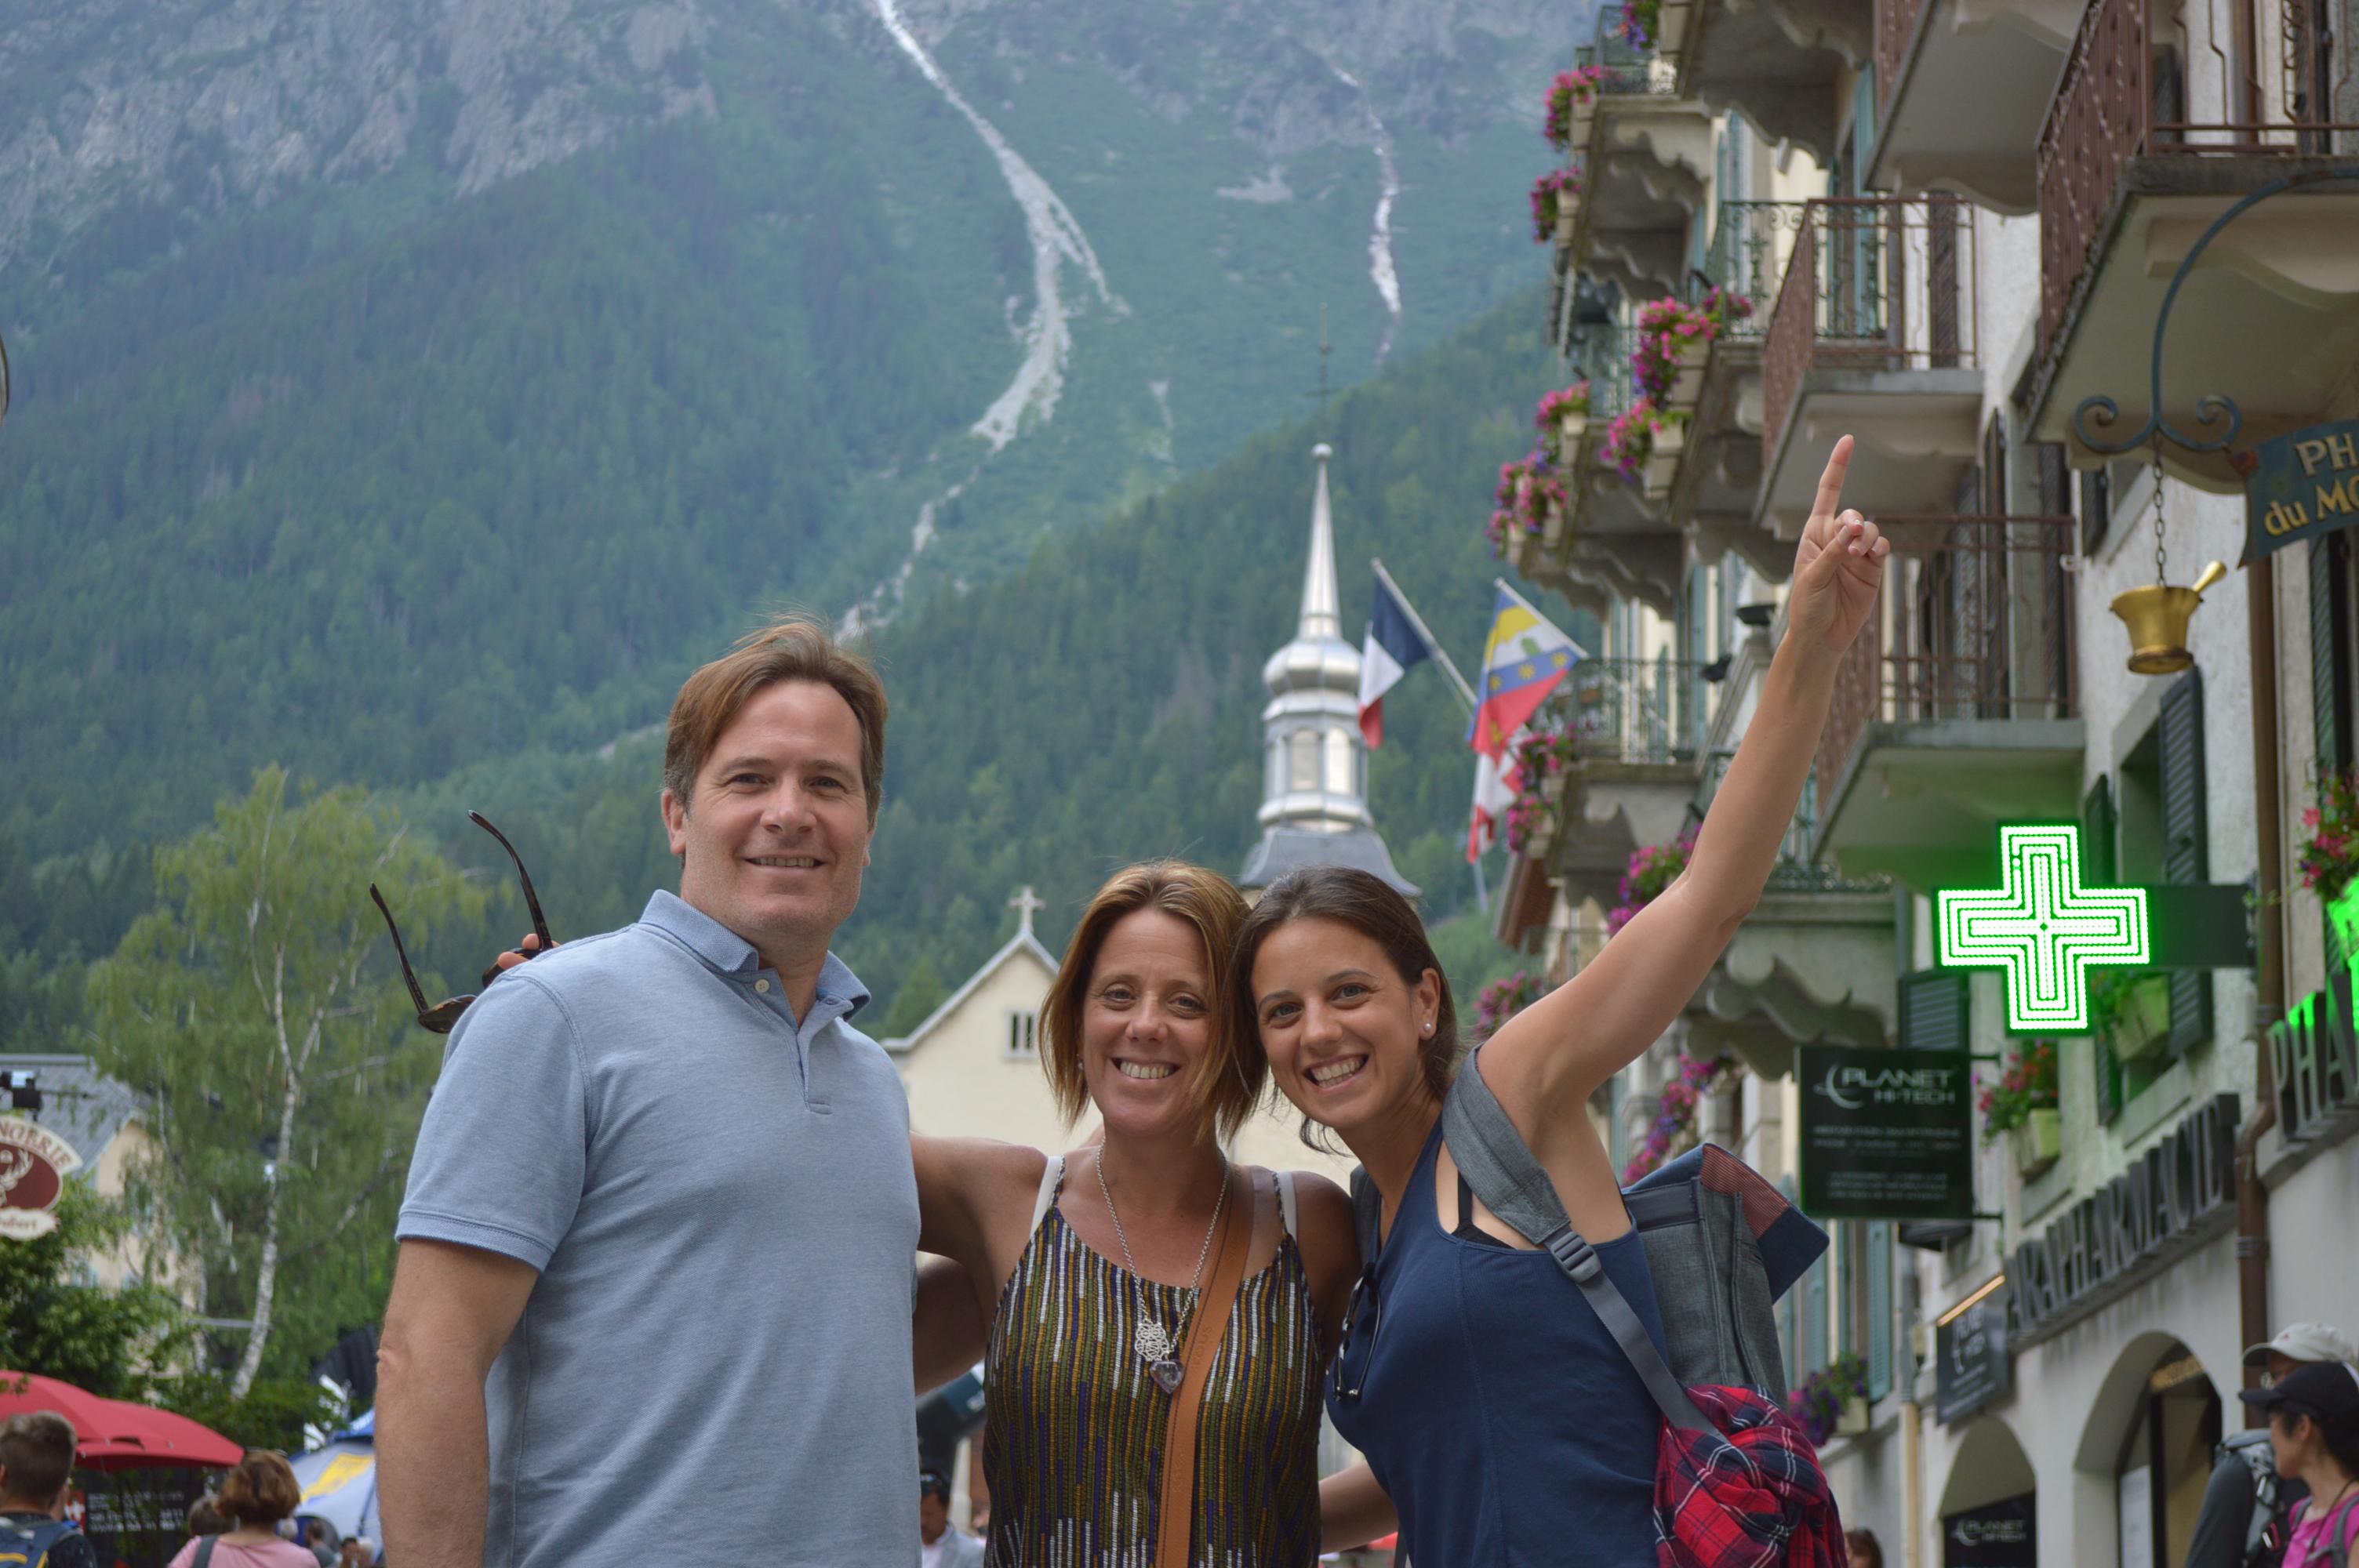 Mont Blanc ya no te tengo miedo! Parte 1 – Llegada de Nati